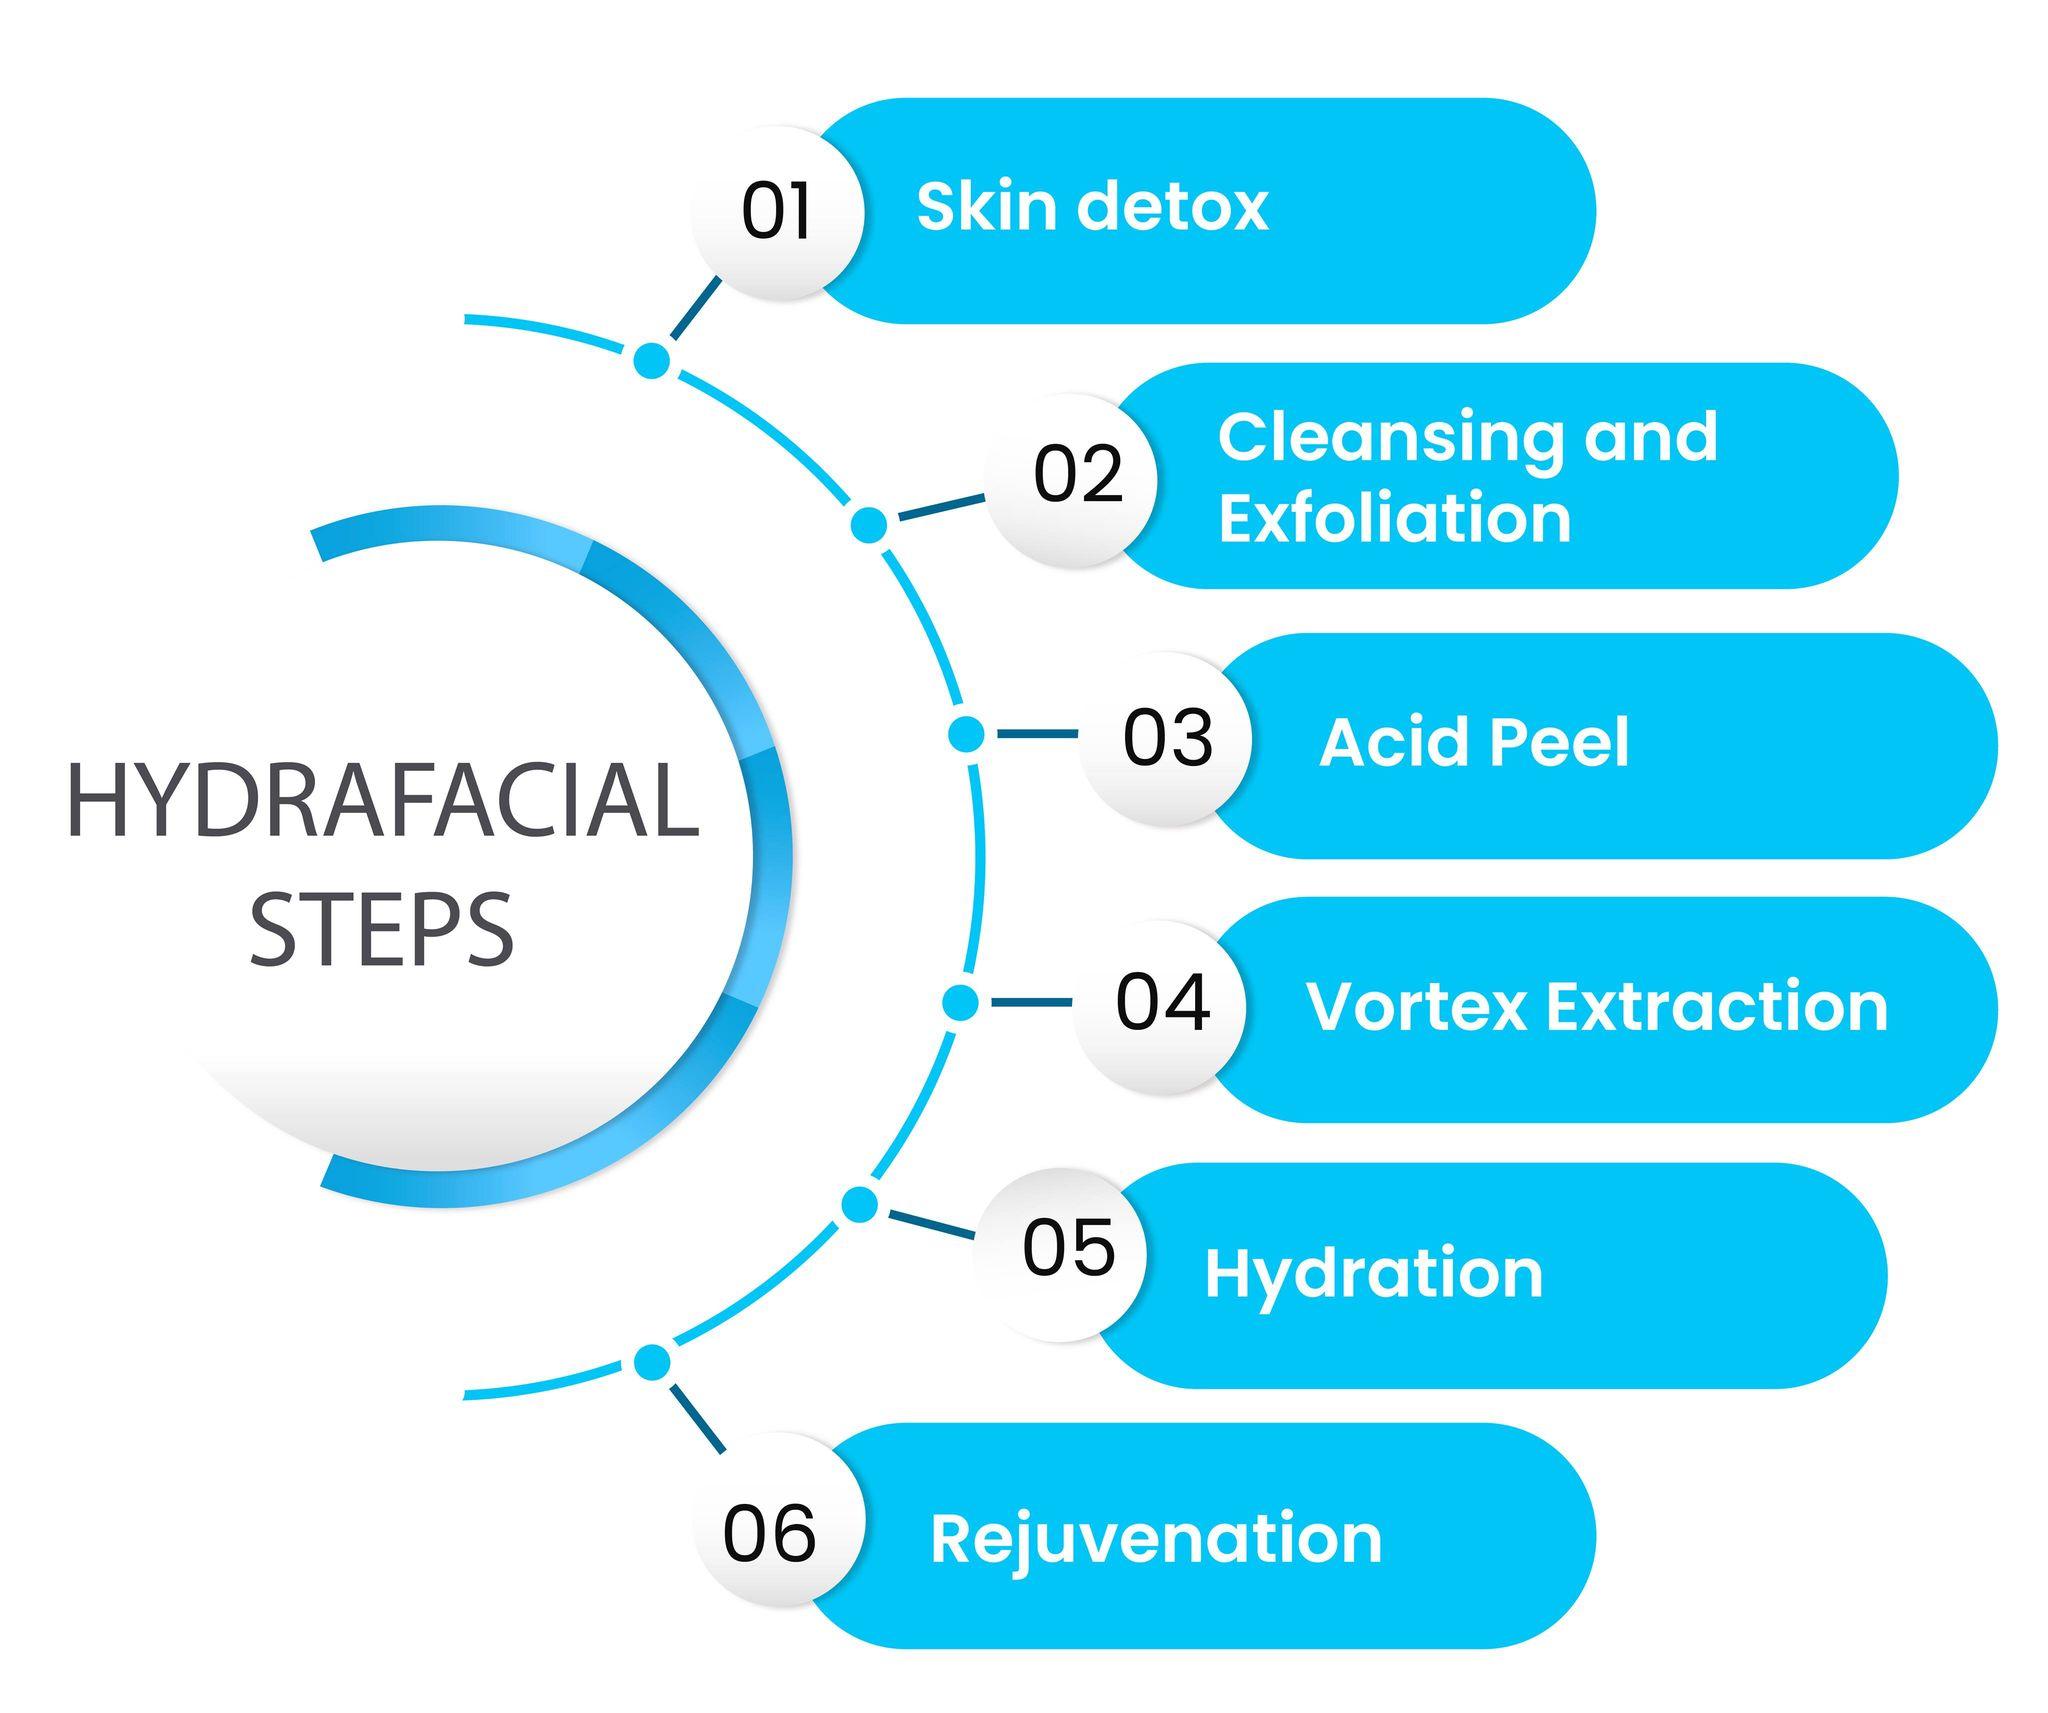 Steps in Hydrafacial Treatment